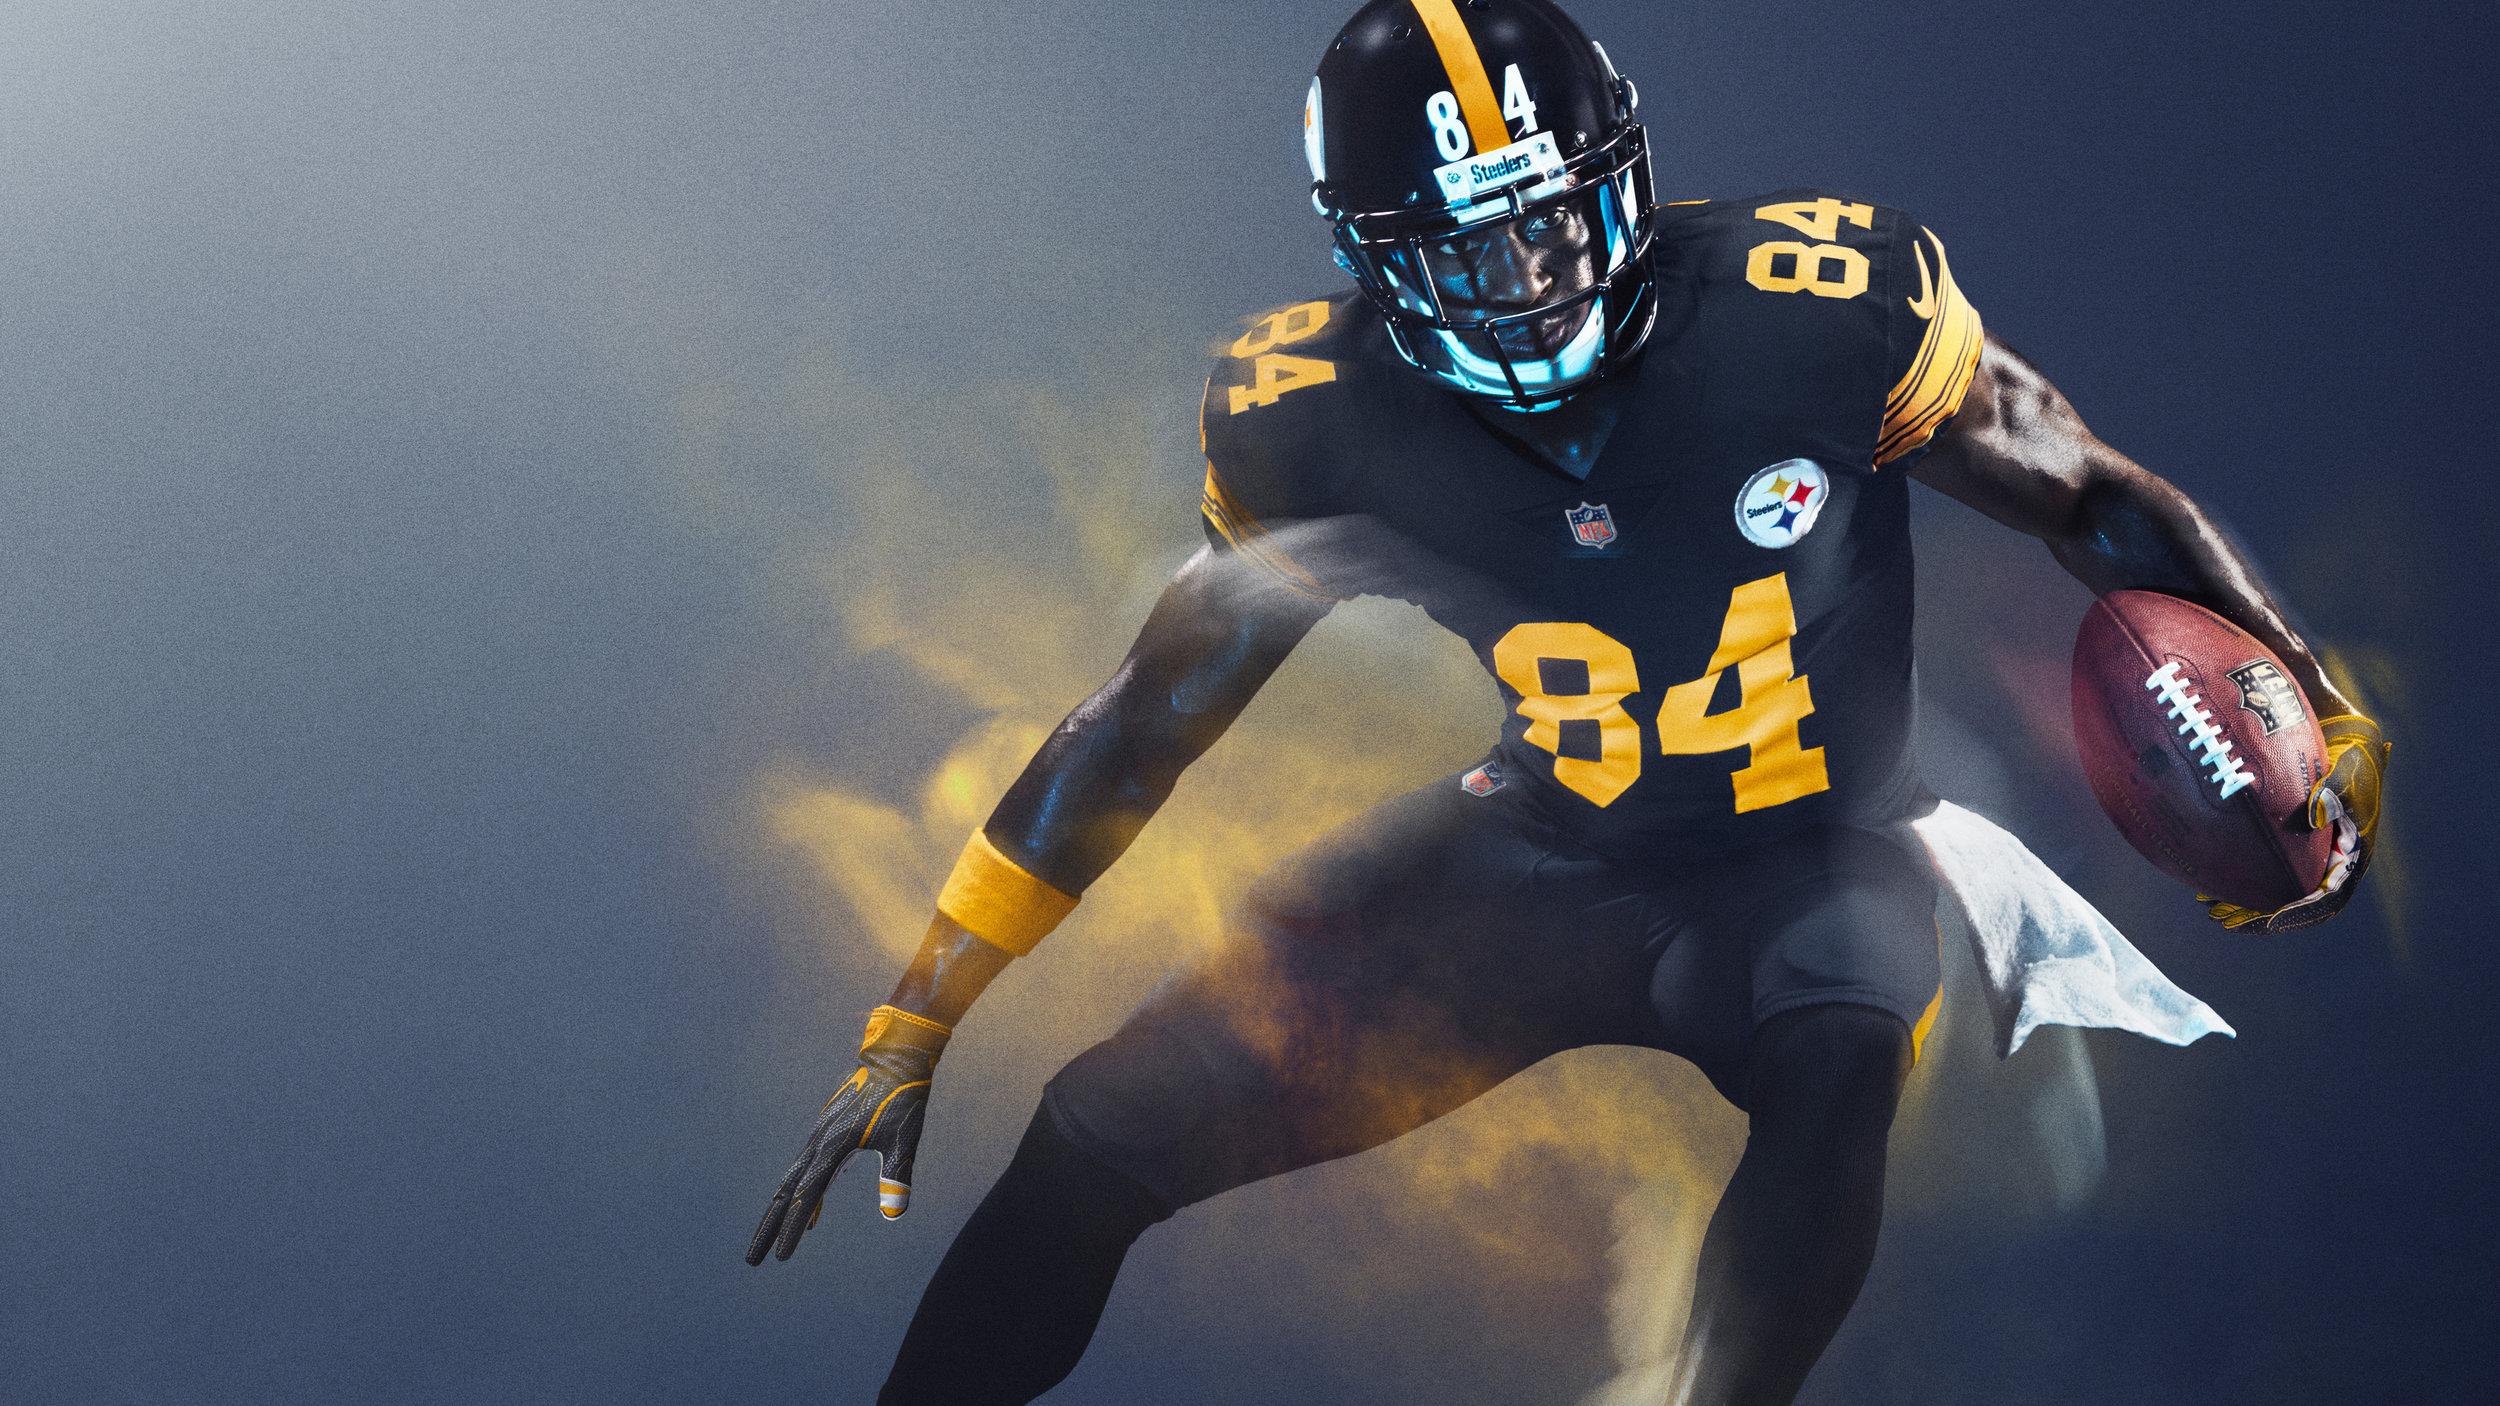 Nike-Football-NFL-Color-Rush-2016_ABrown_62117.jpg